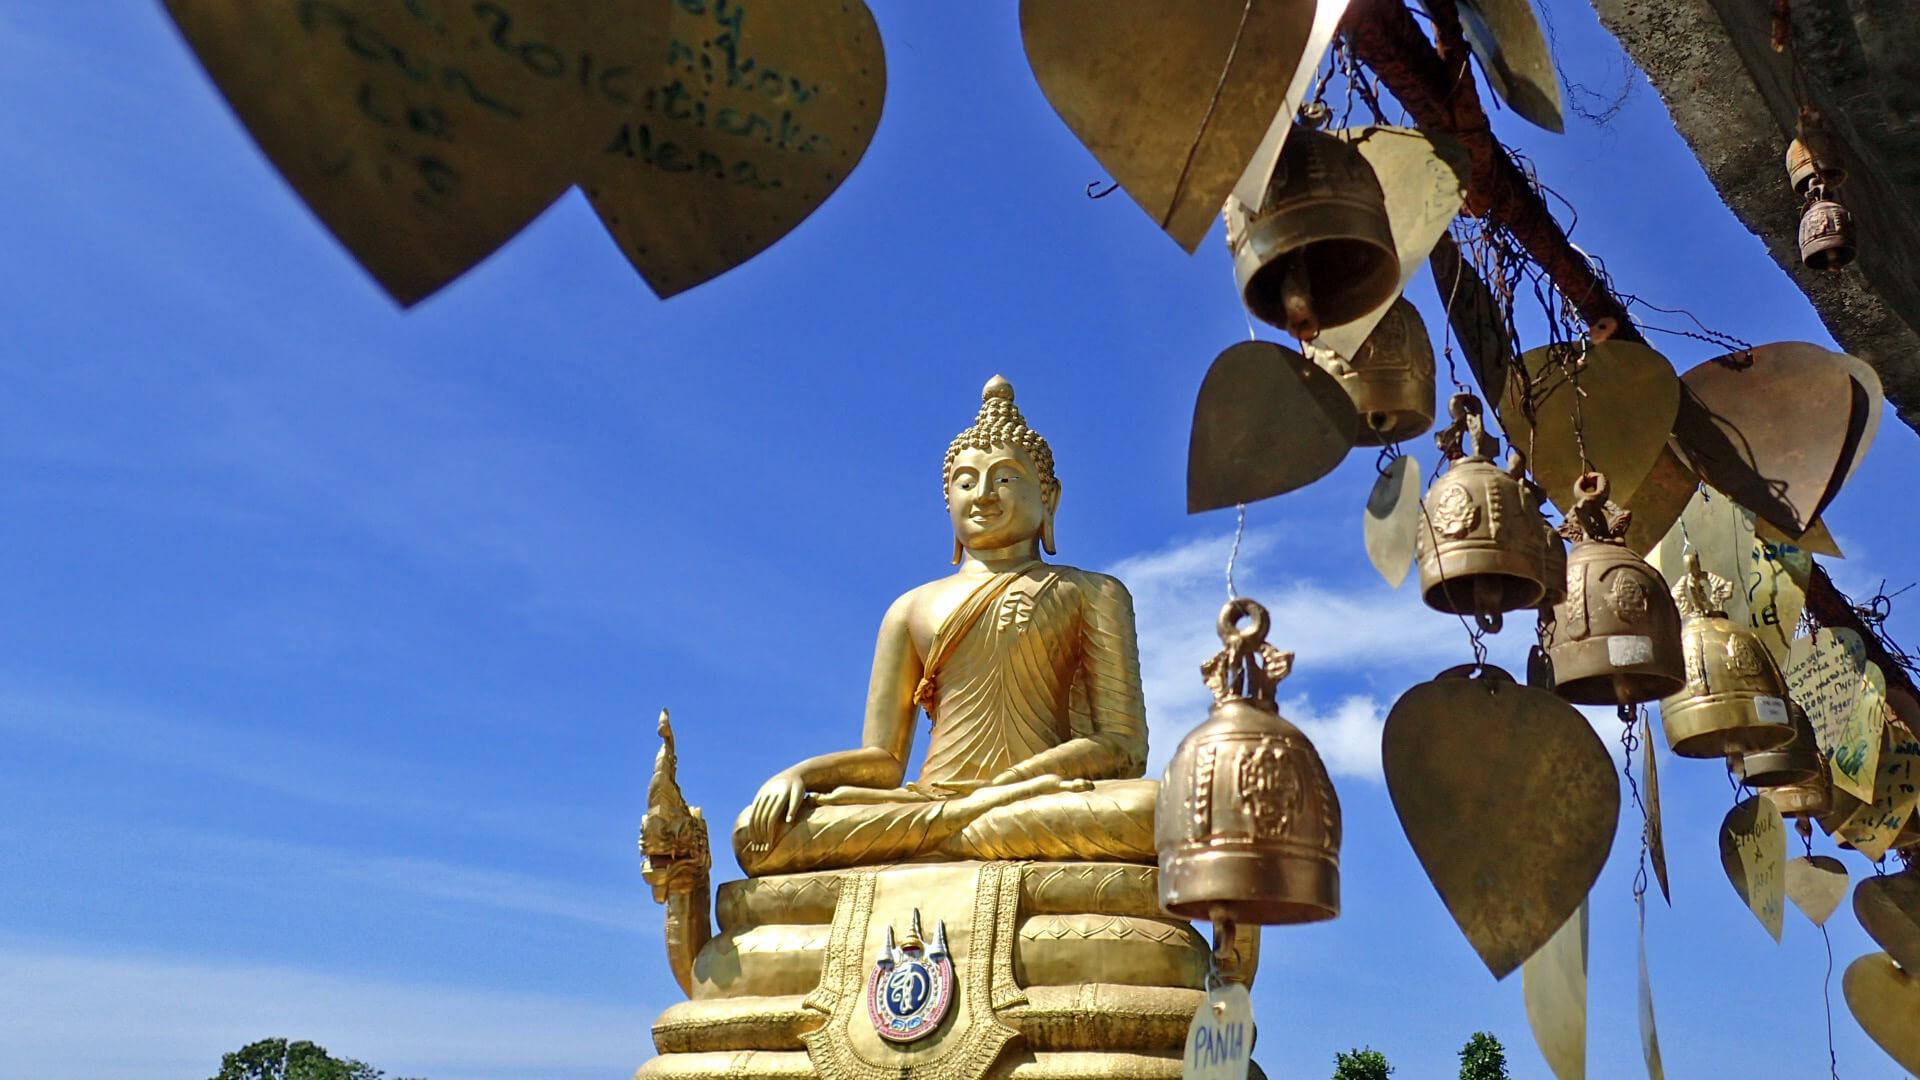 enjoy the sites on phuket without the mass tourism